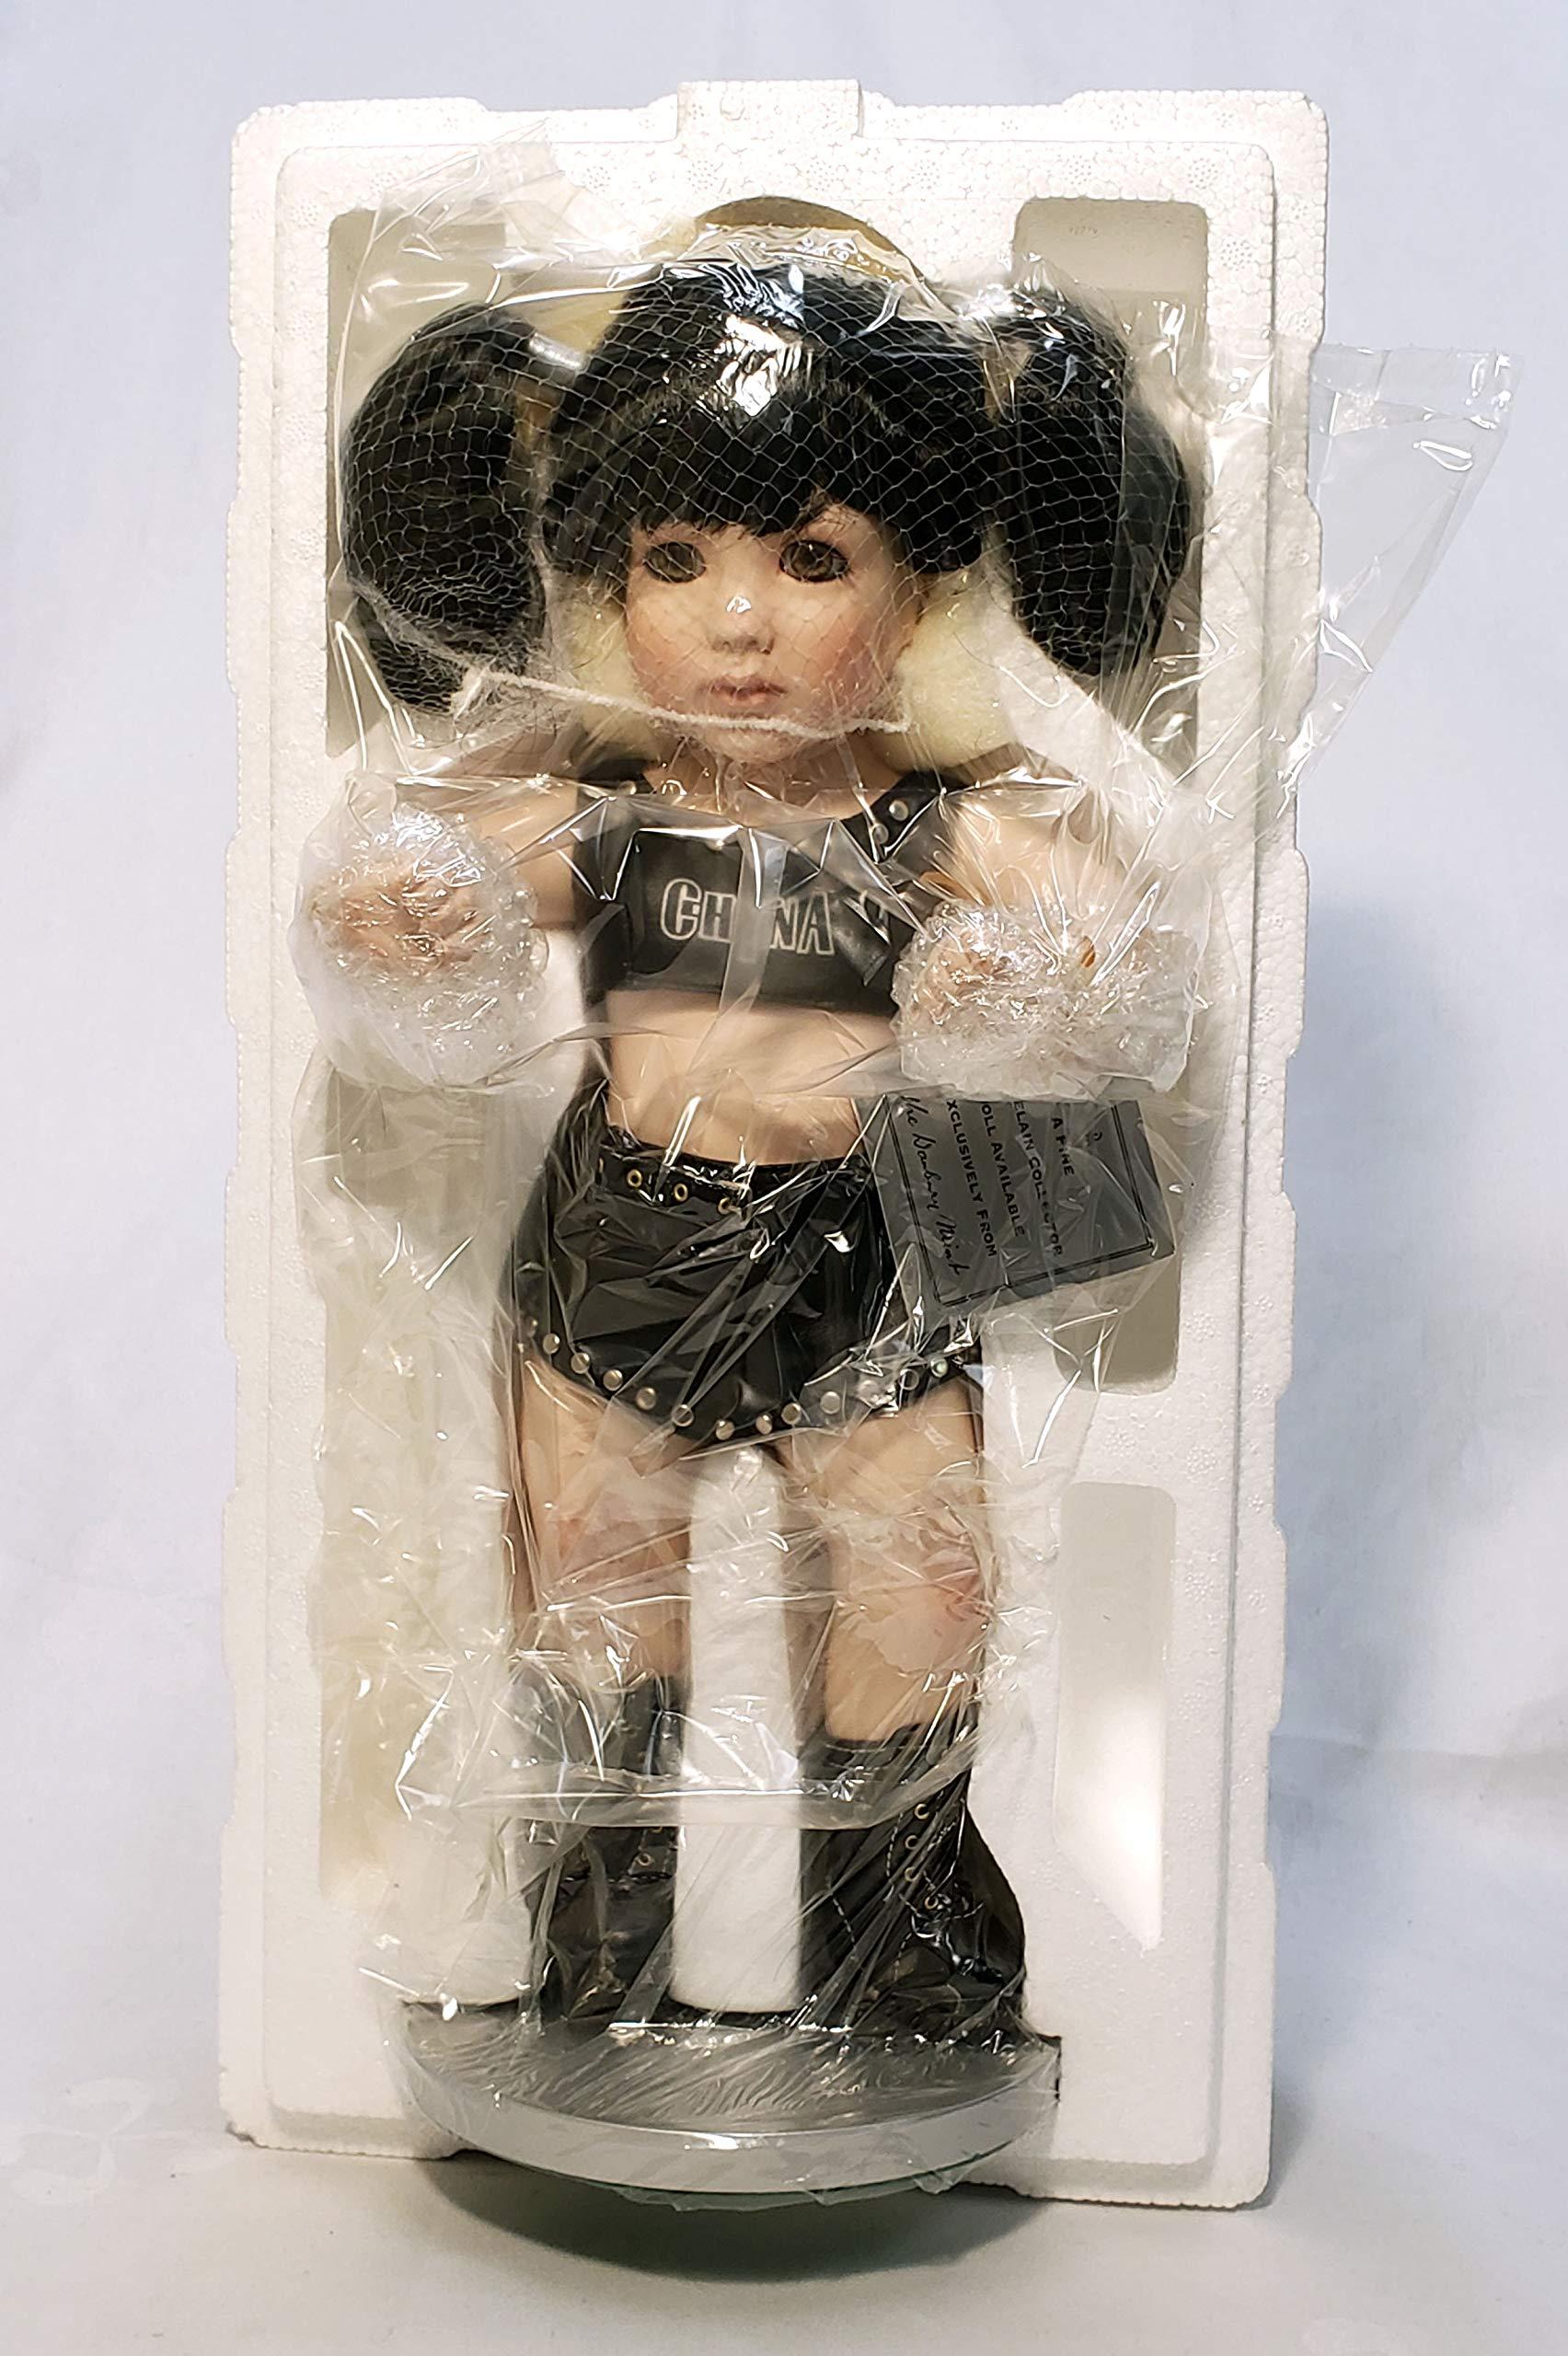 WWF Little Chyna Porcelain Doll by Danbury Mint